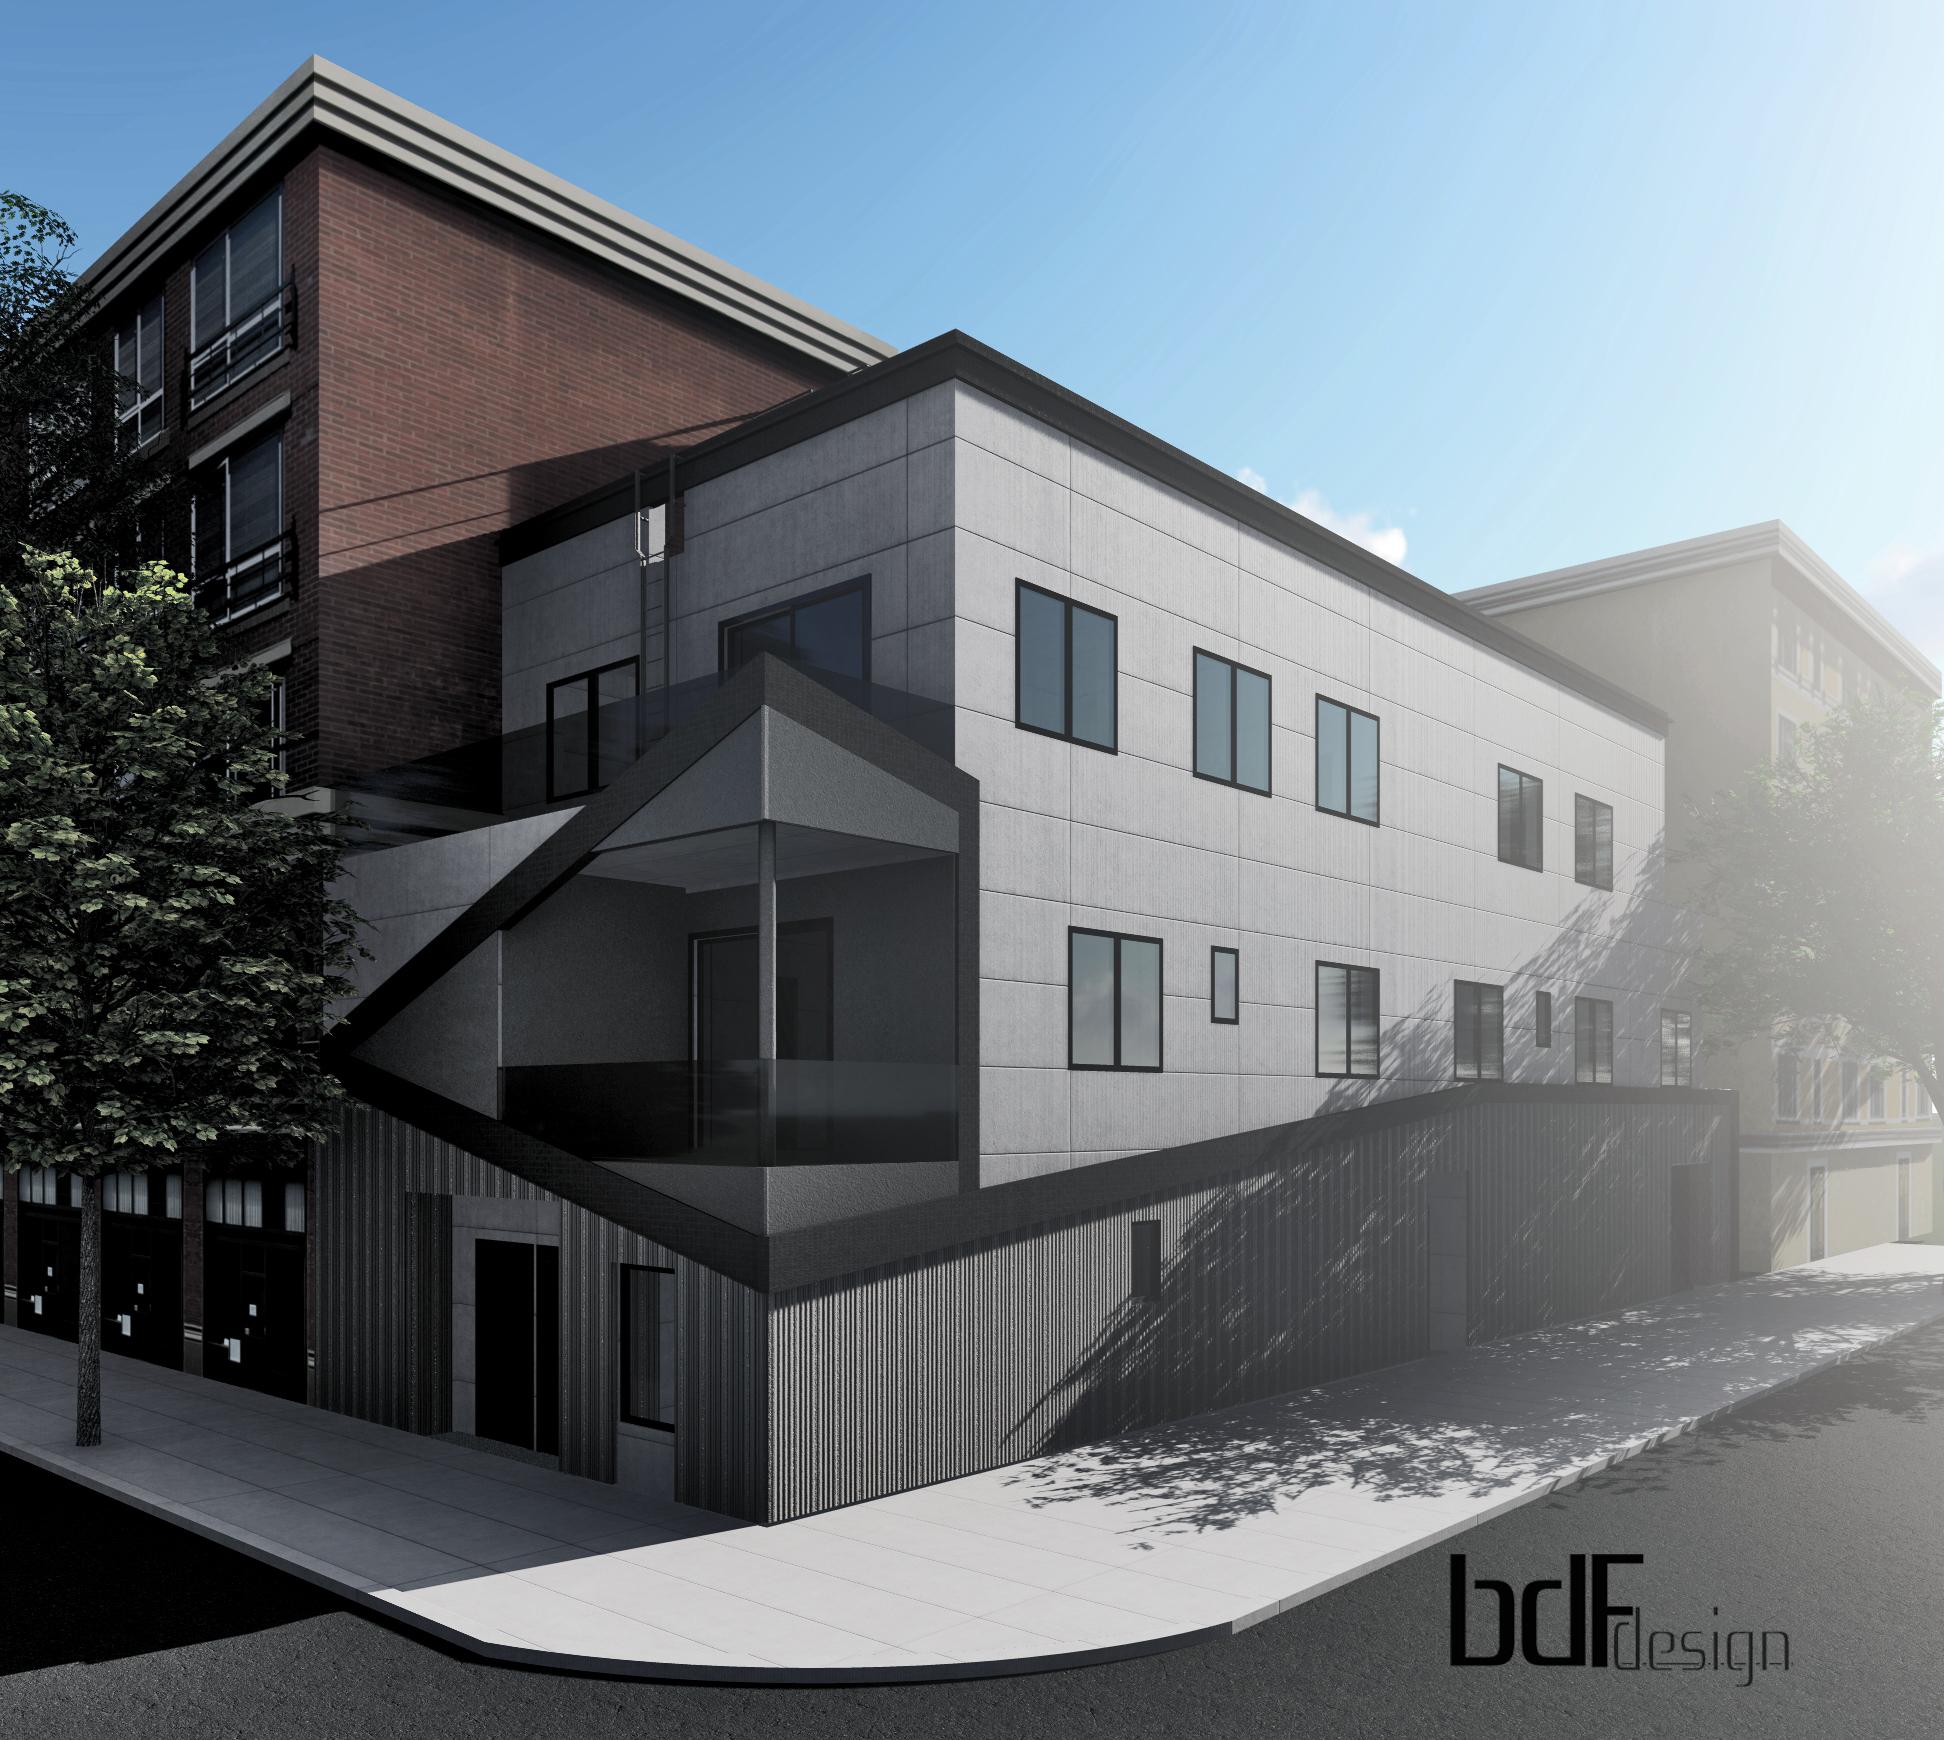 Rendering of 67 Engert Avenue - BDF Design